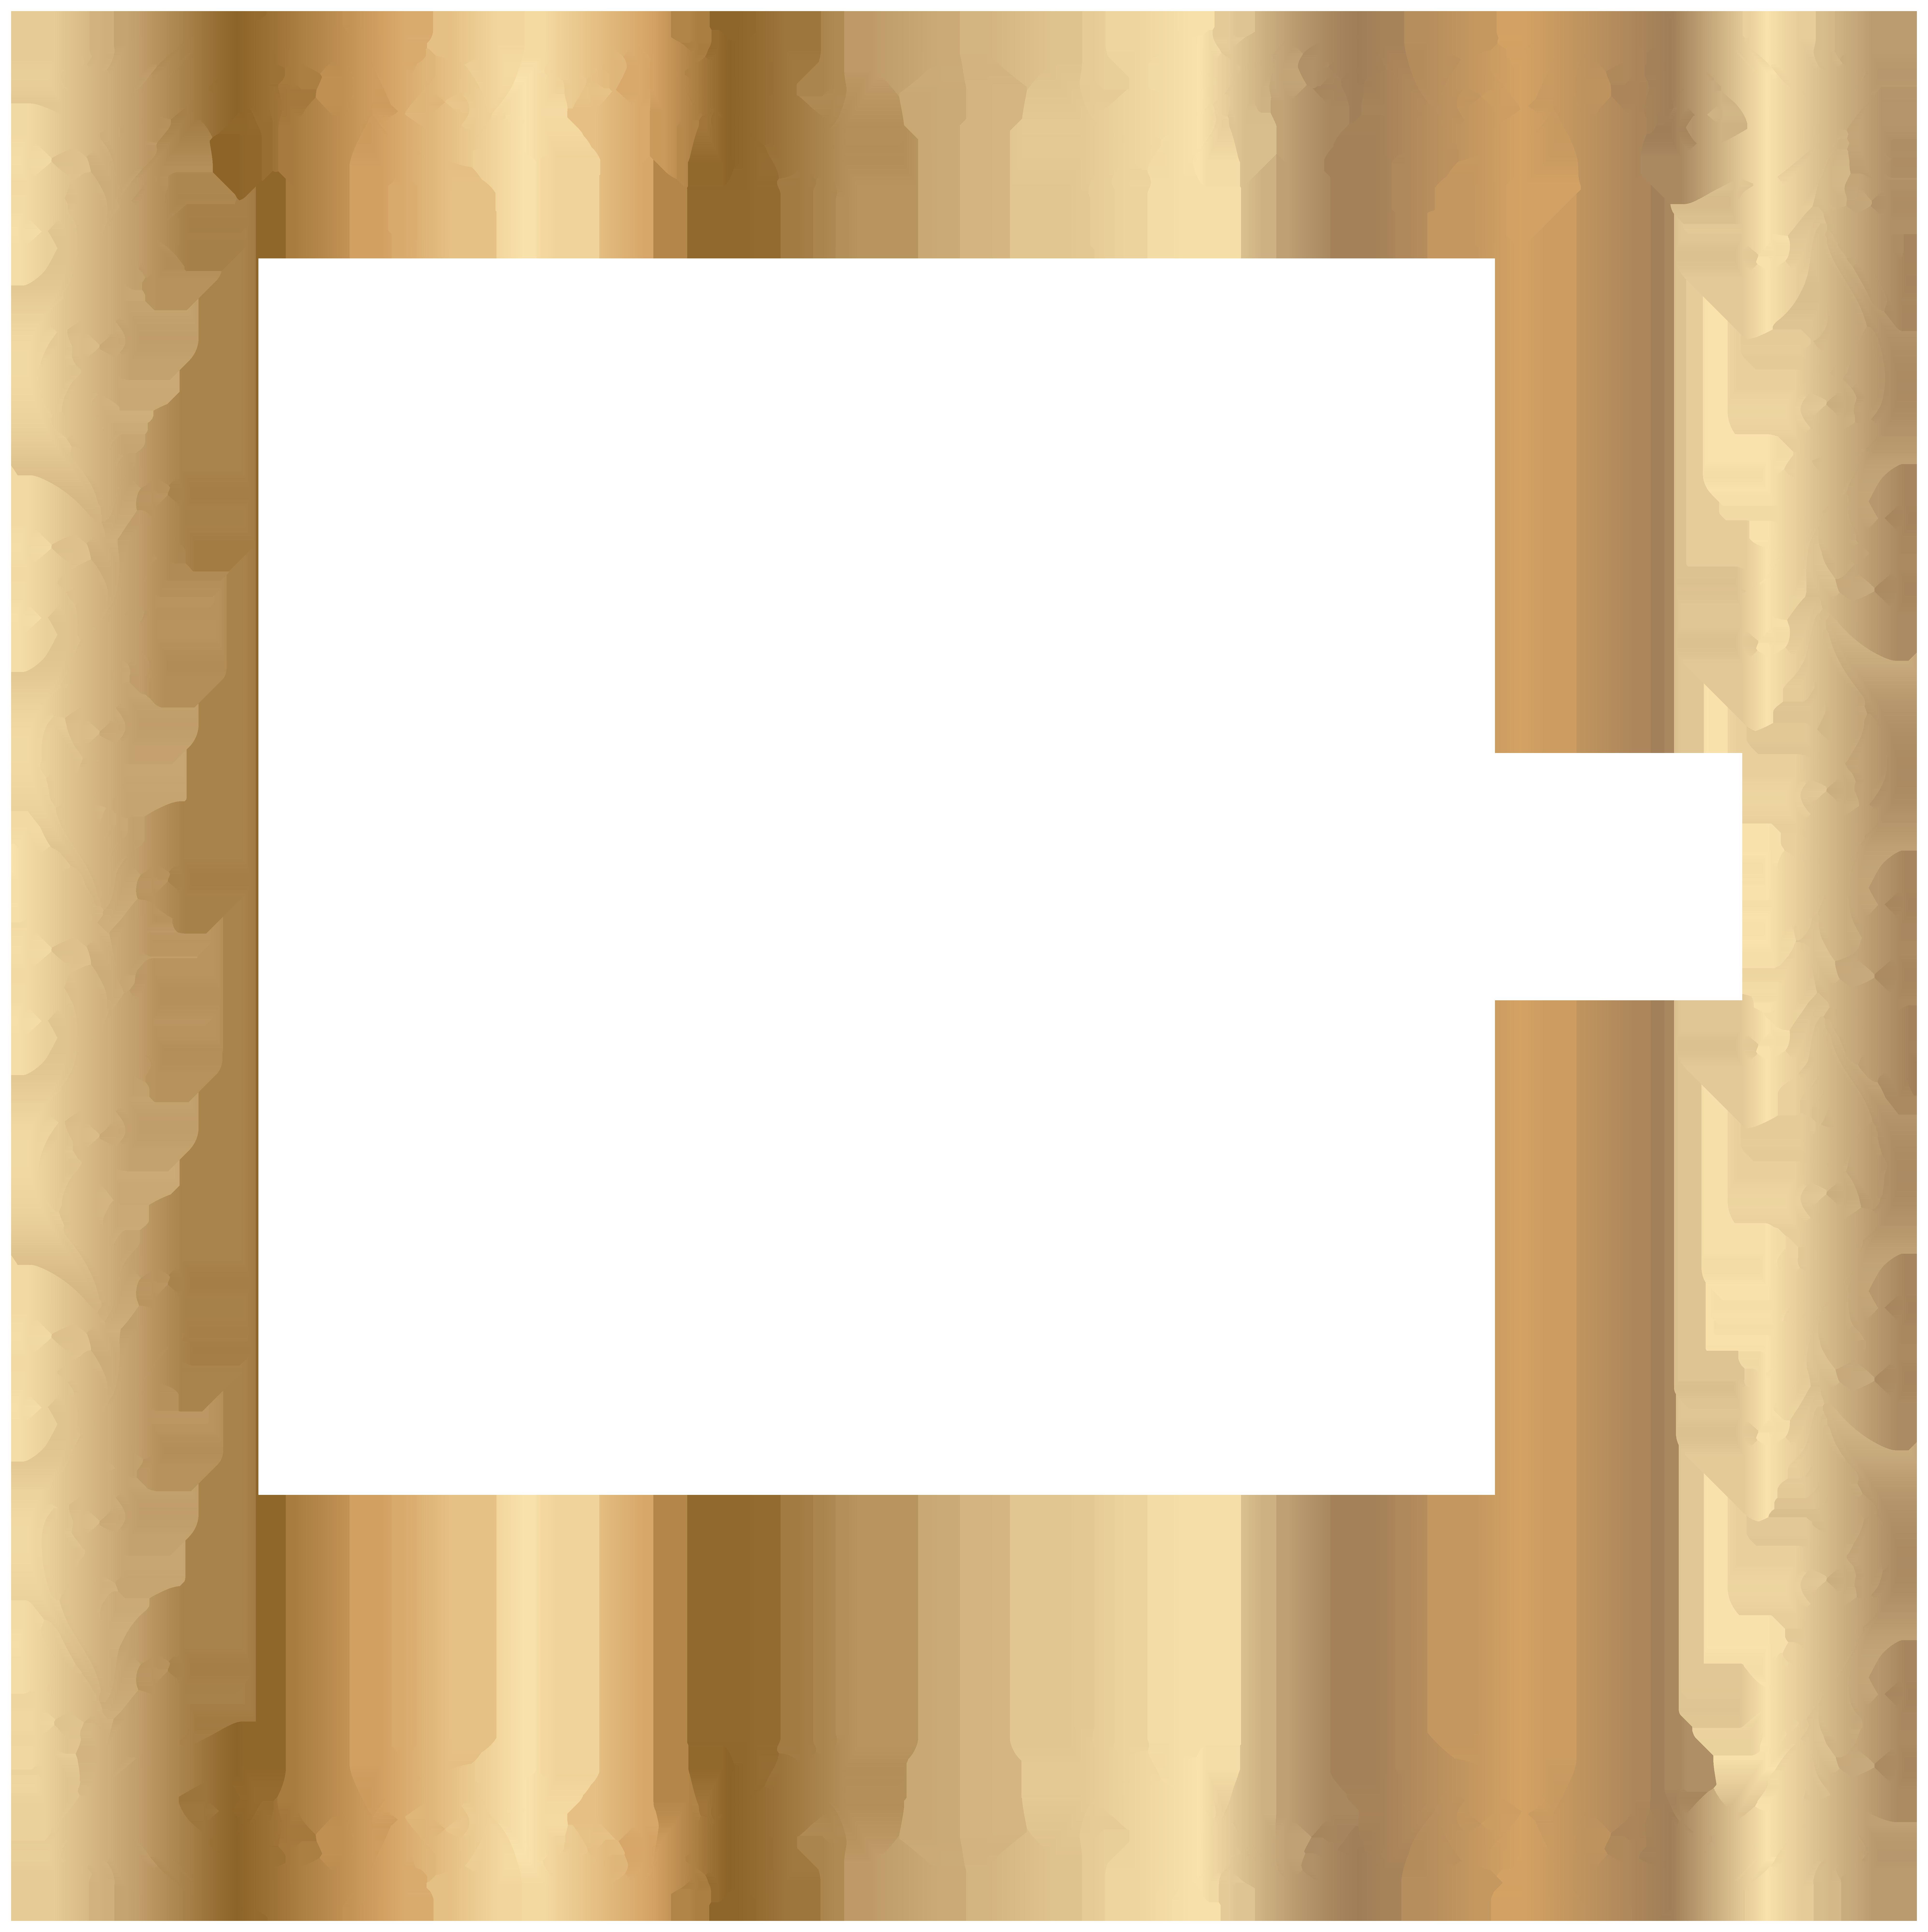 Border Deco Frame Gold Transparent PNG Image | mara ...